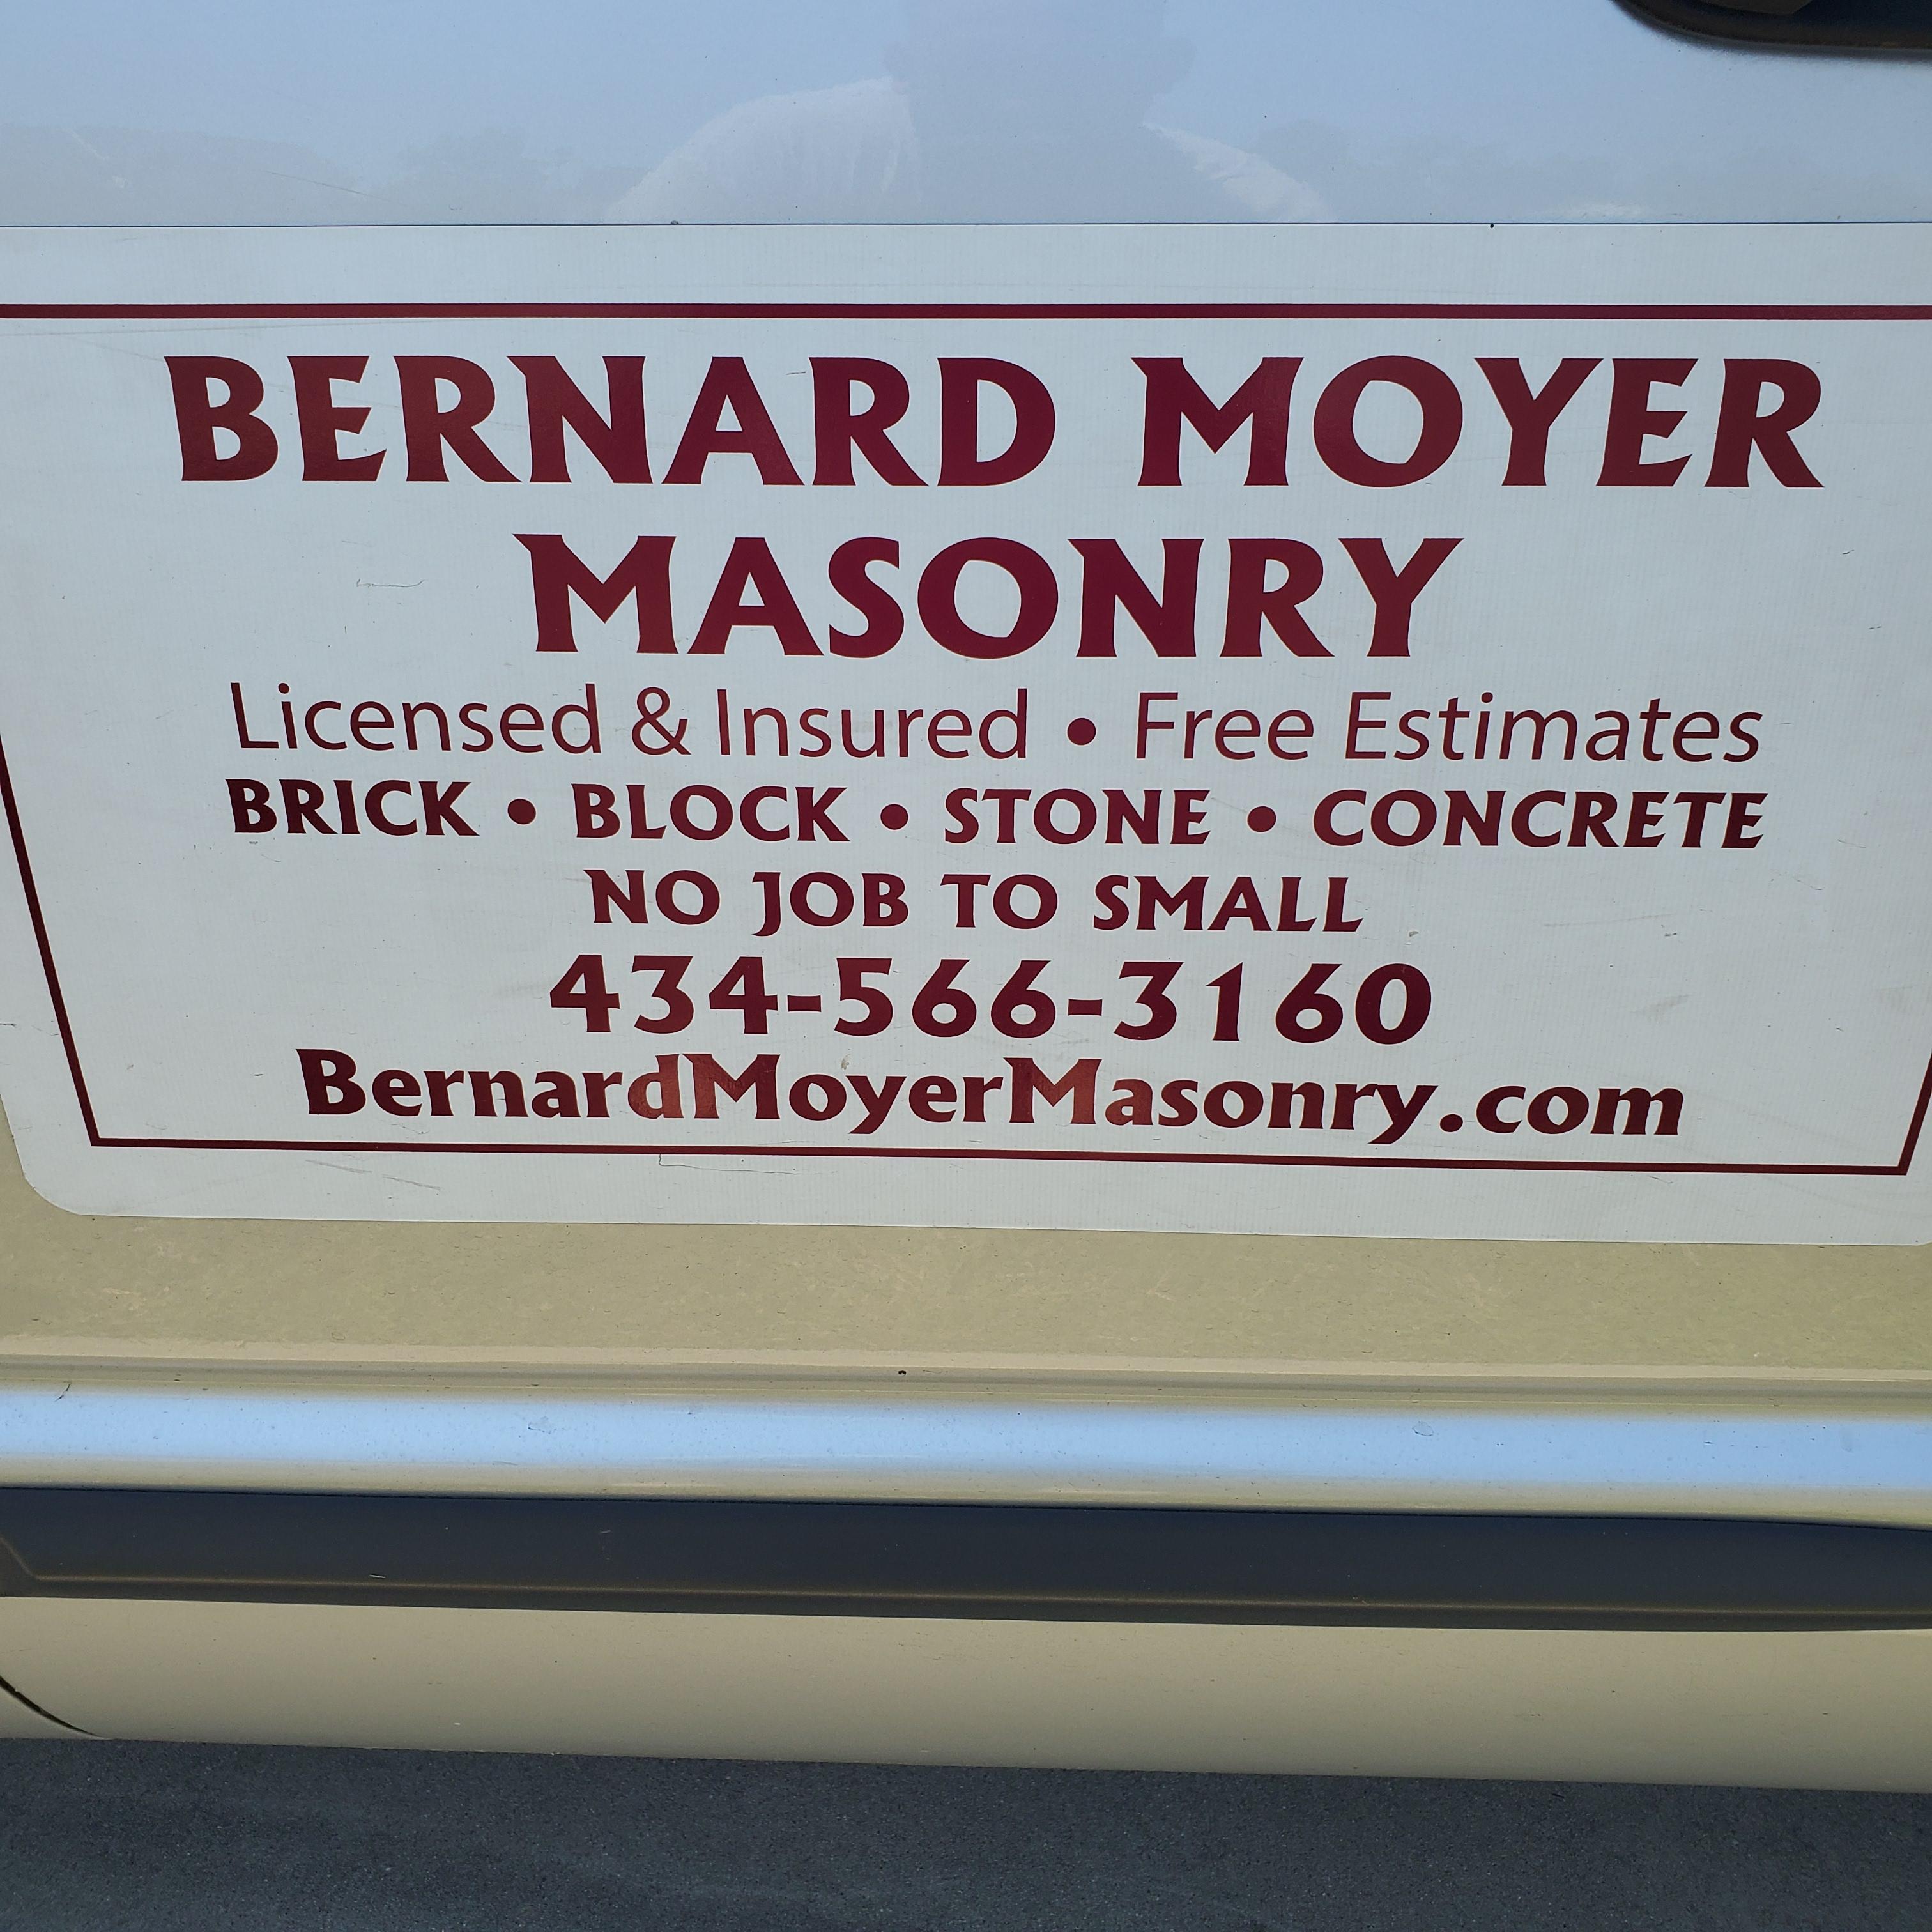 Bernard Moyer Masonry